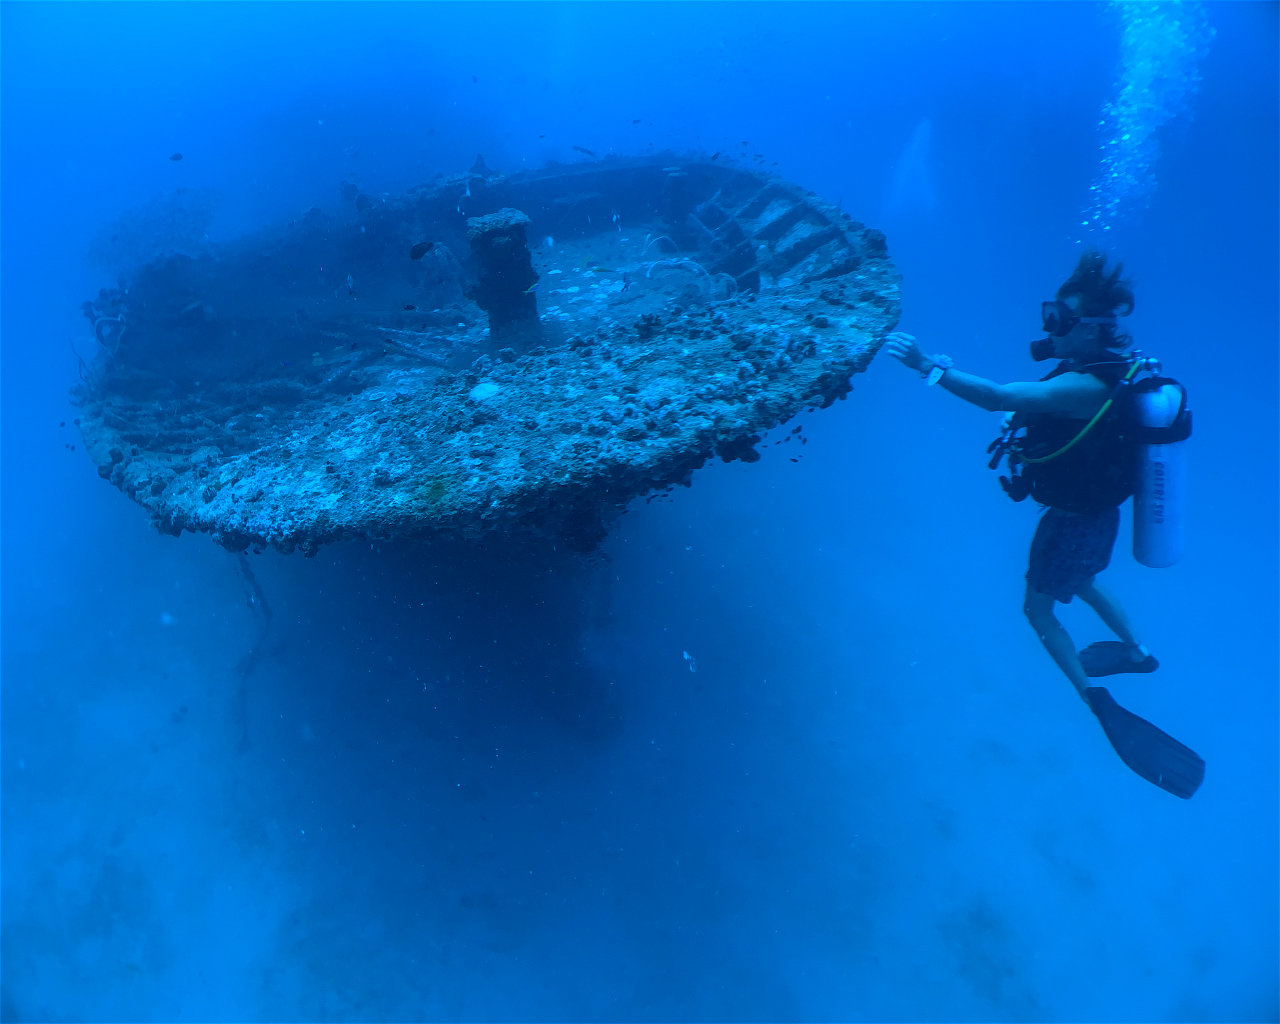 Aldebaran Wreck